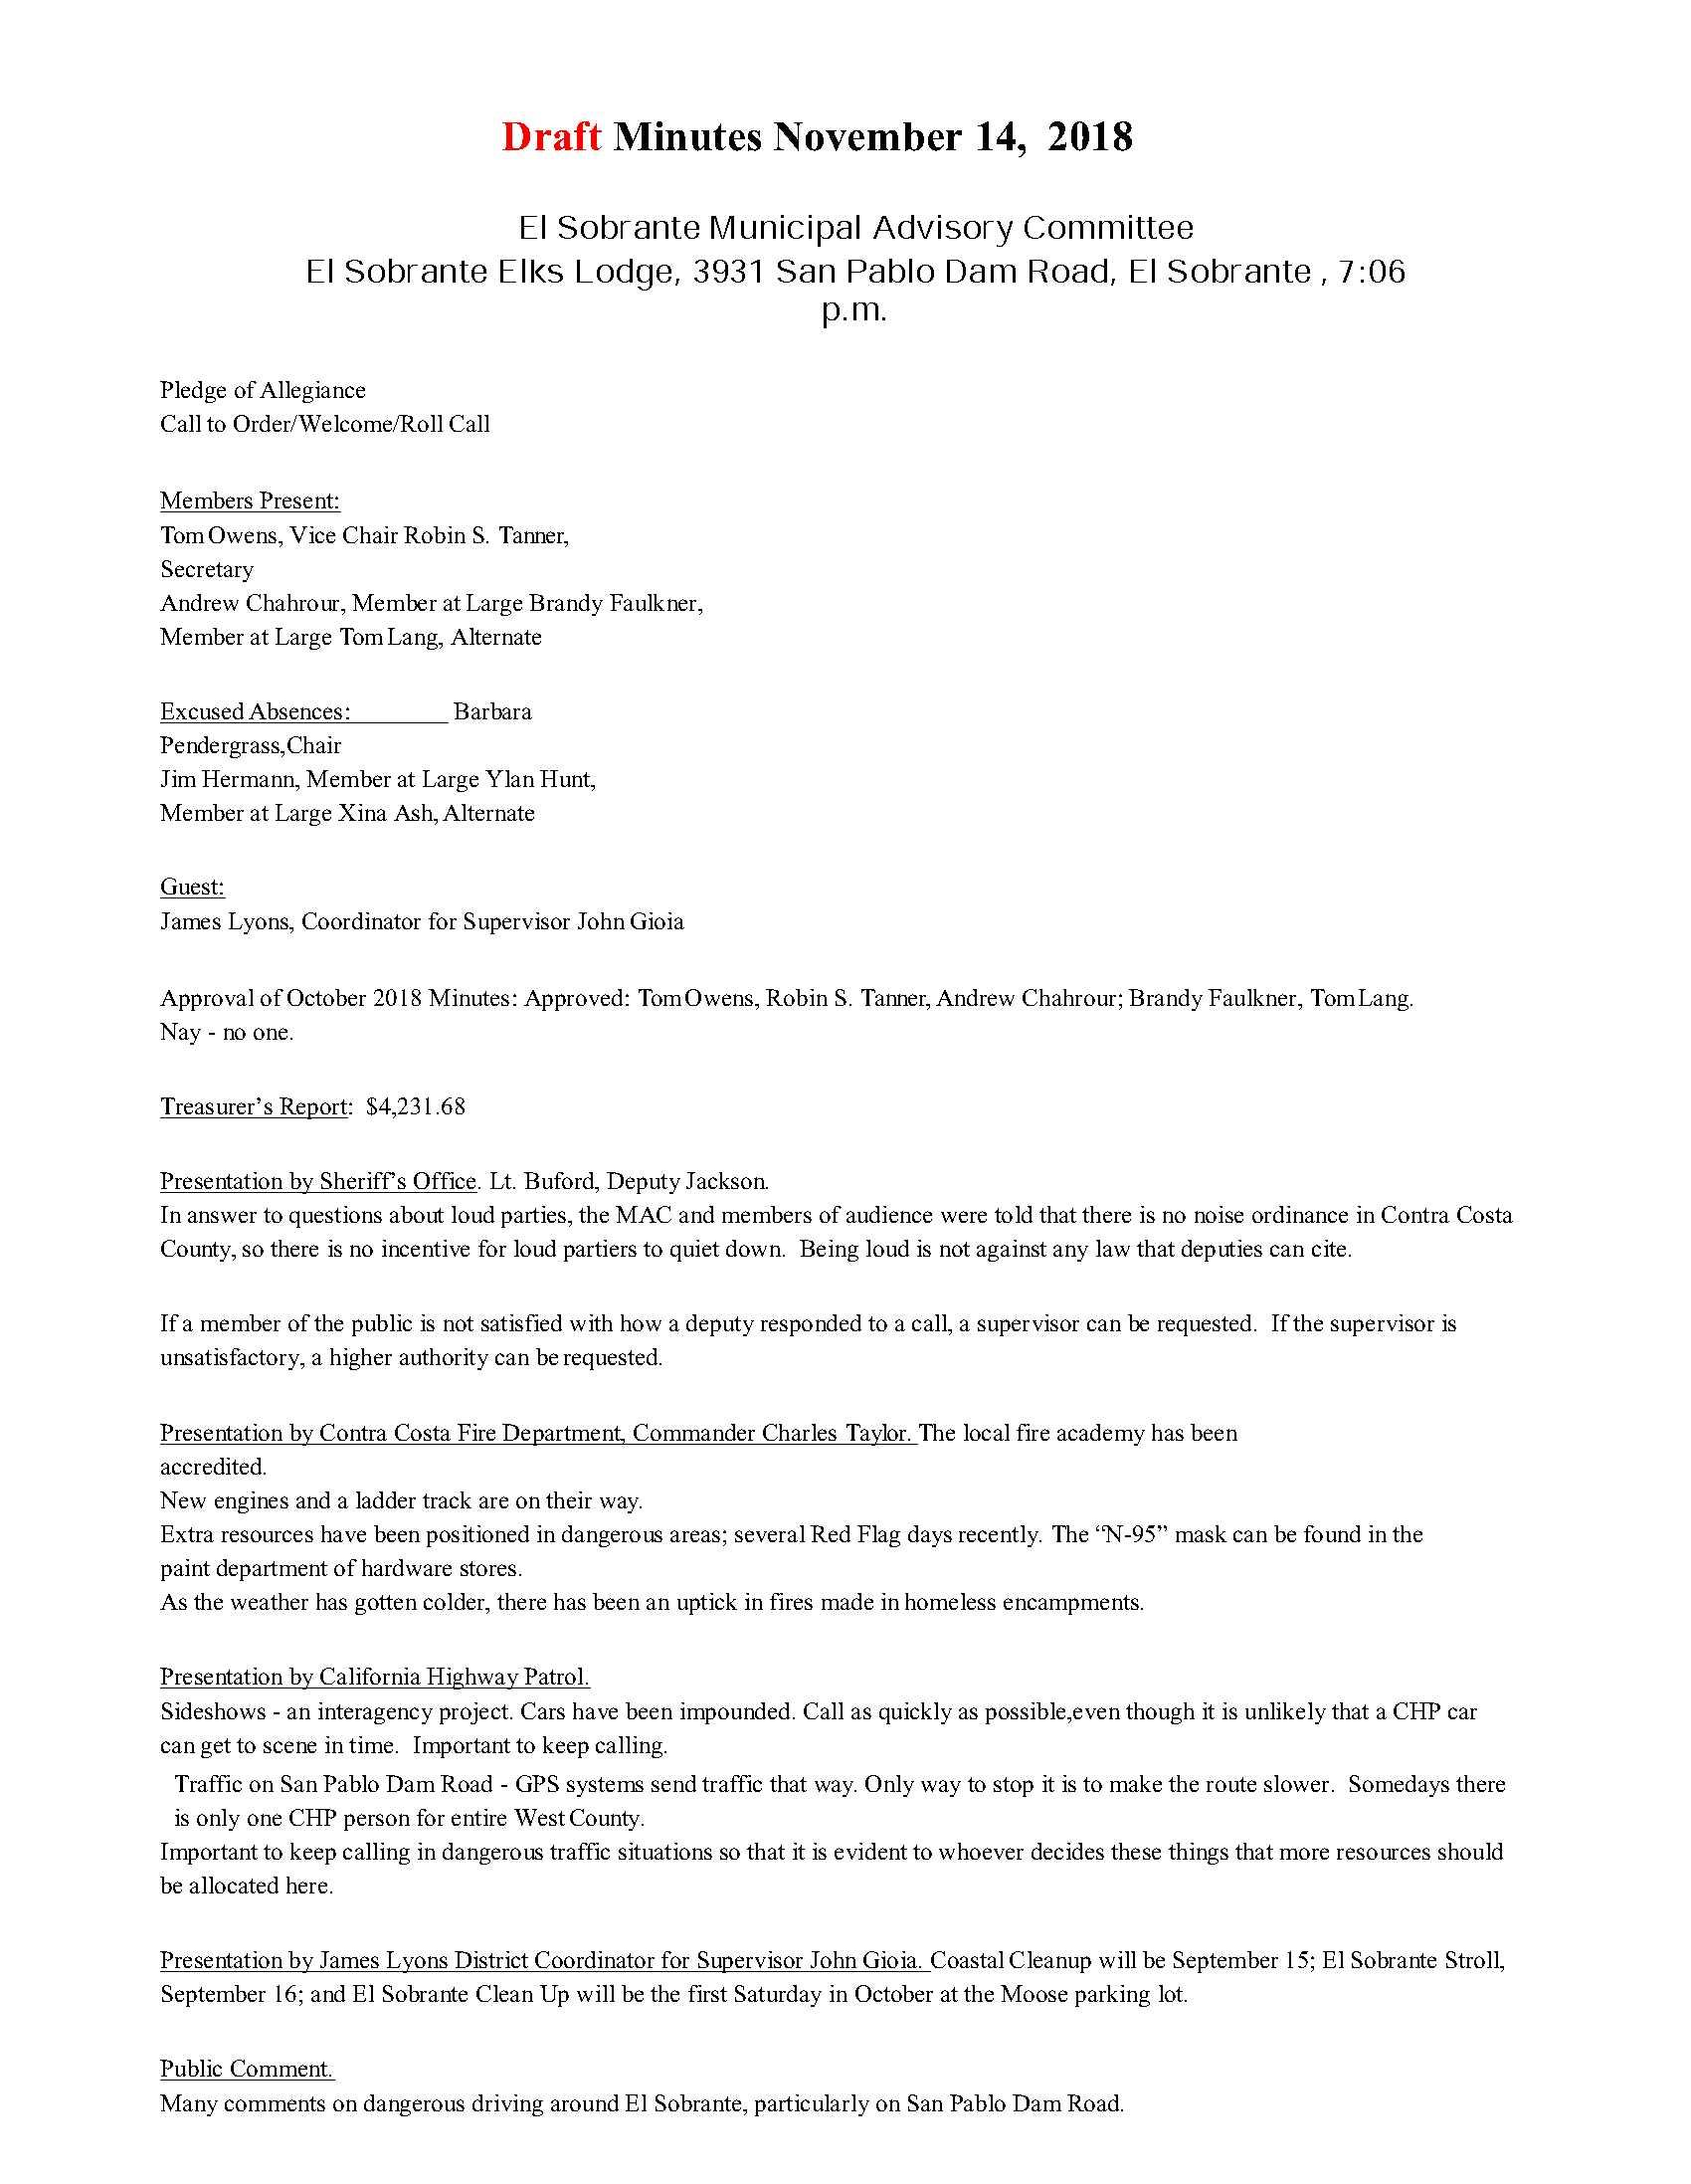 ESMAC Agenda 12.13.2018 (51 Pages)_3.jpg